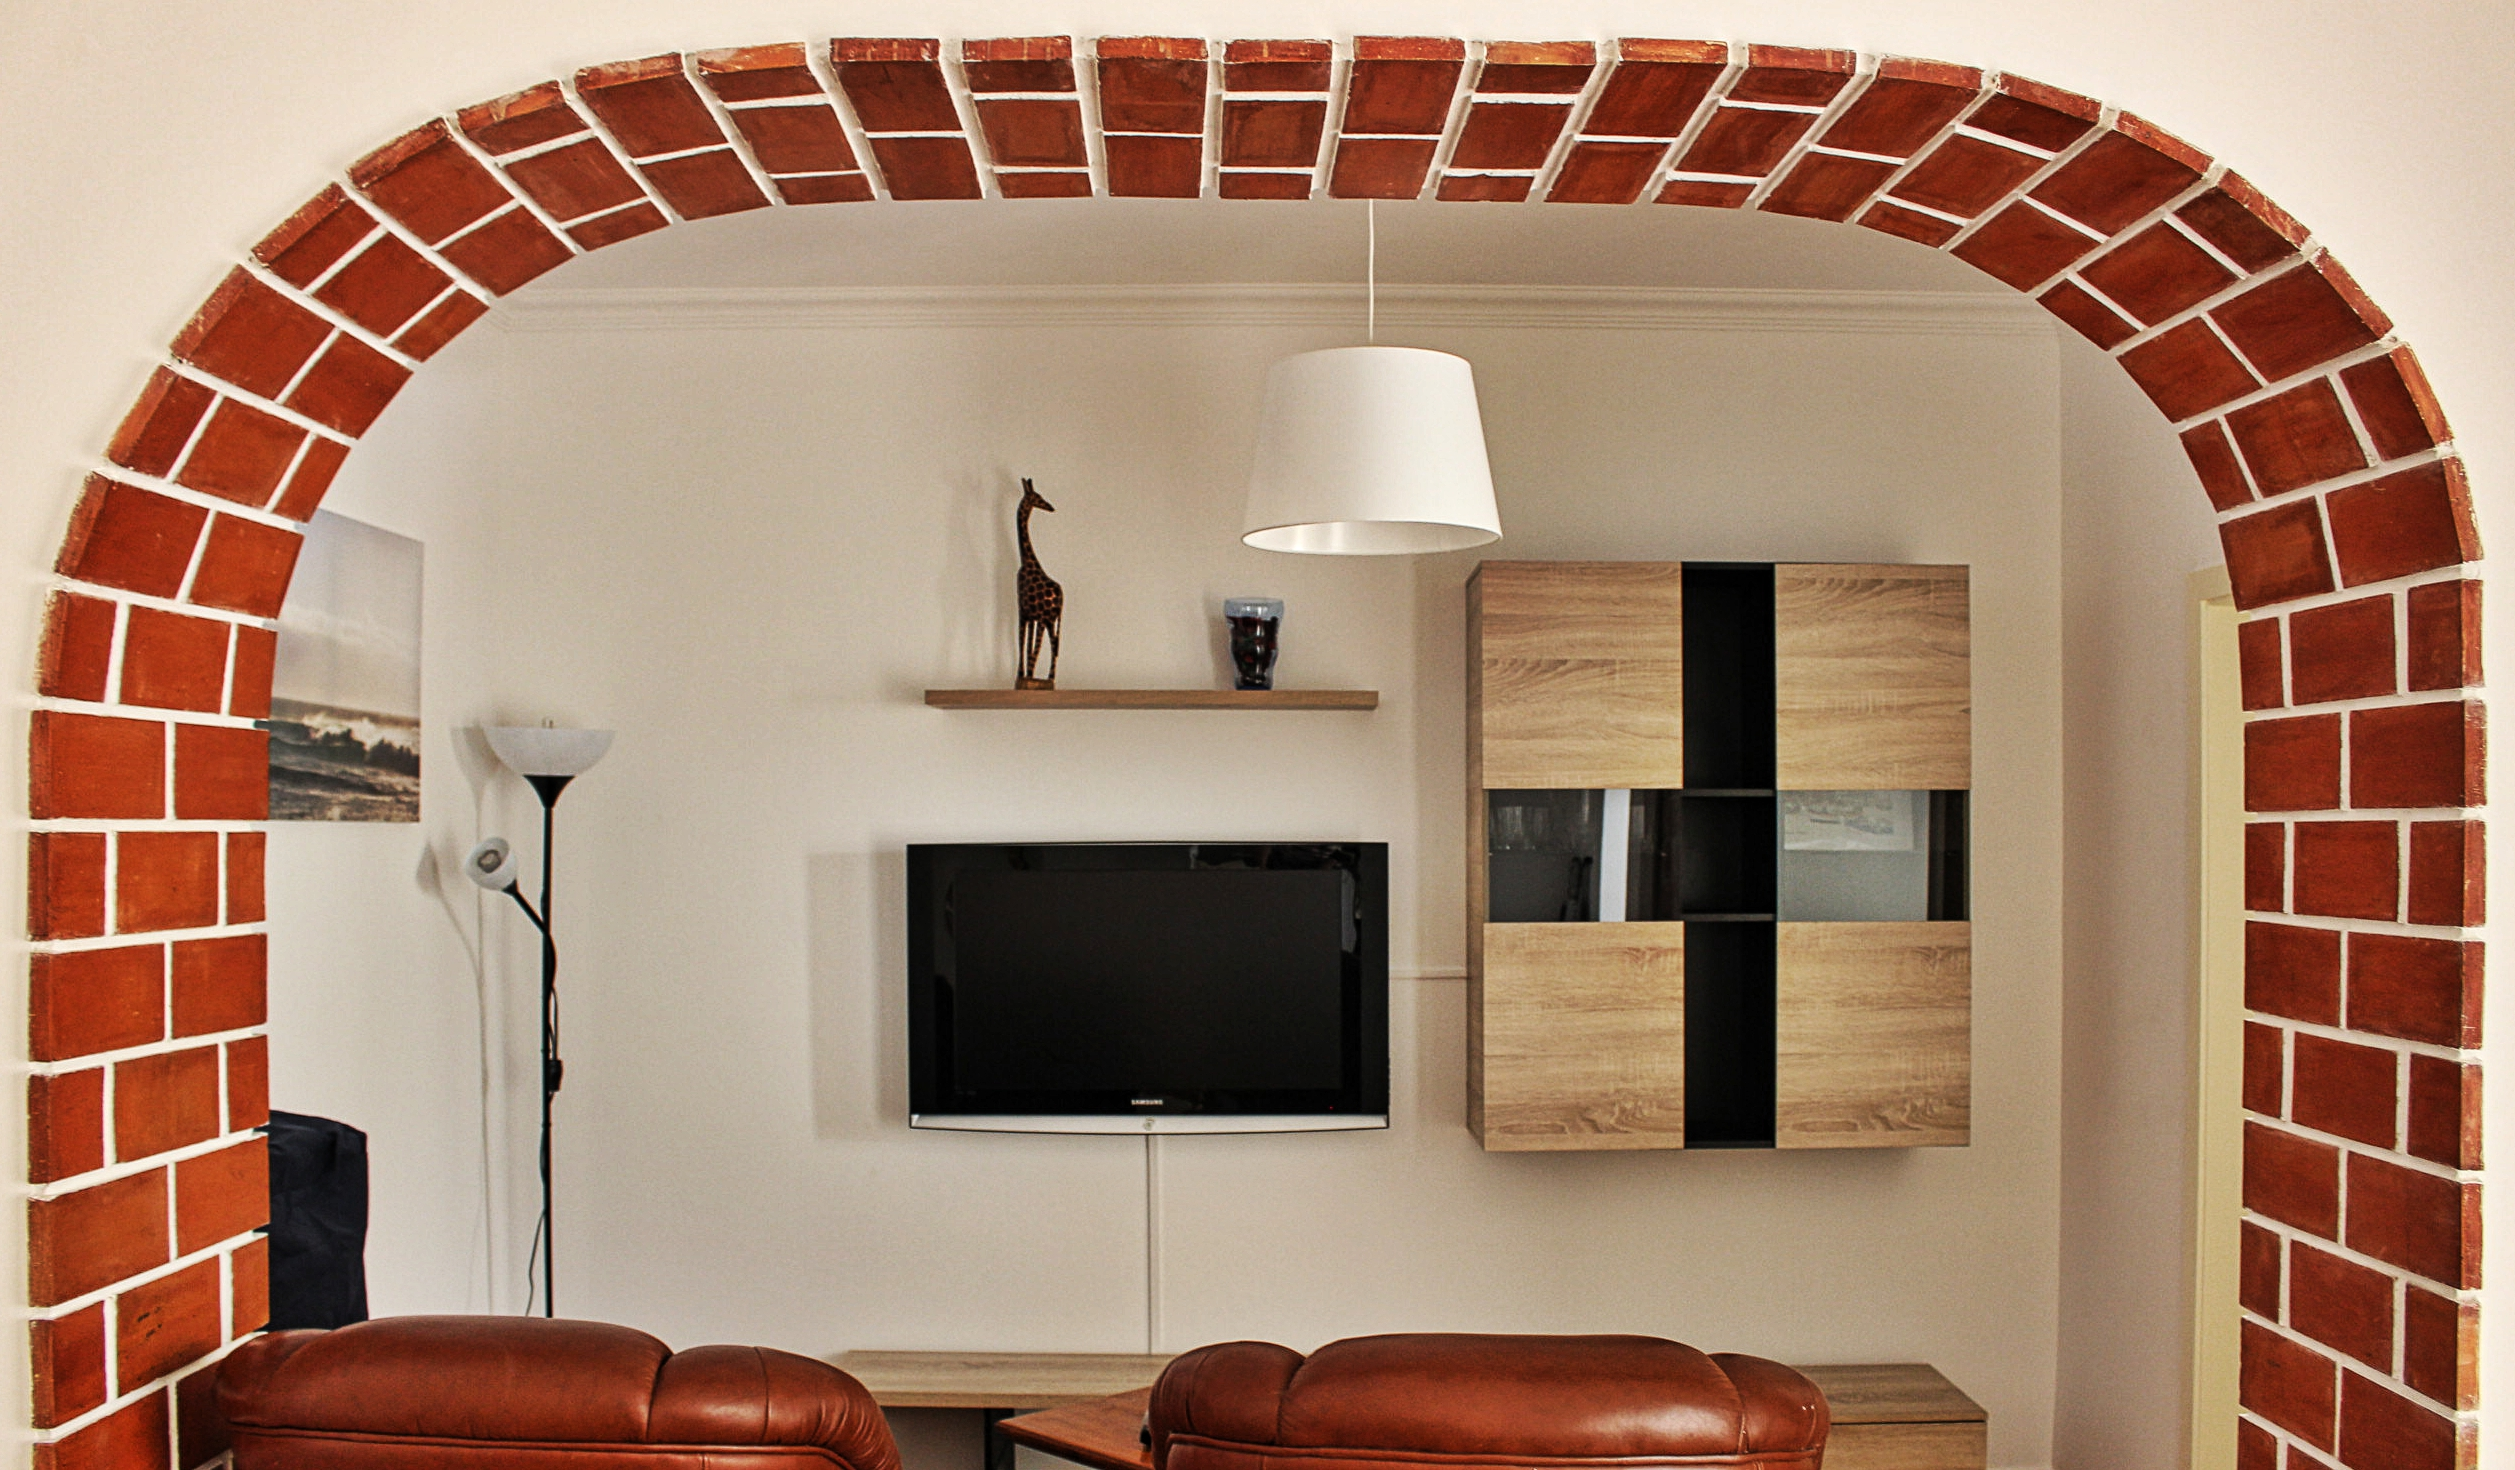 Location appartements et villas de vacance, Moradia T2 no Centro de Albufeira (Algarve) à Albufeira, Portugal Algarve, REF_IMG_3078_3083